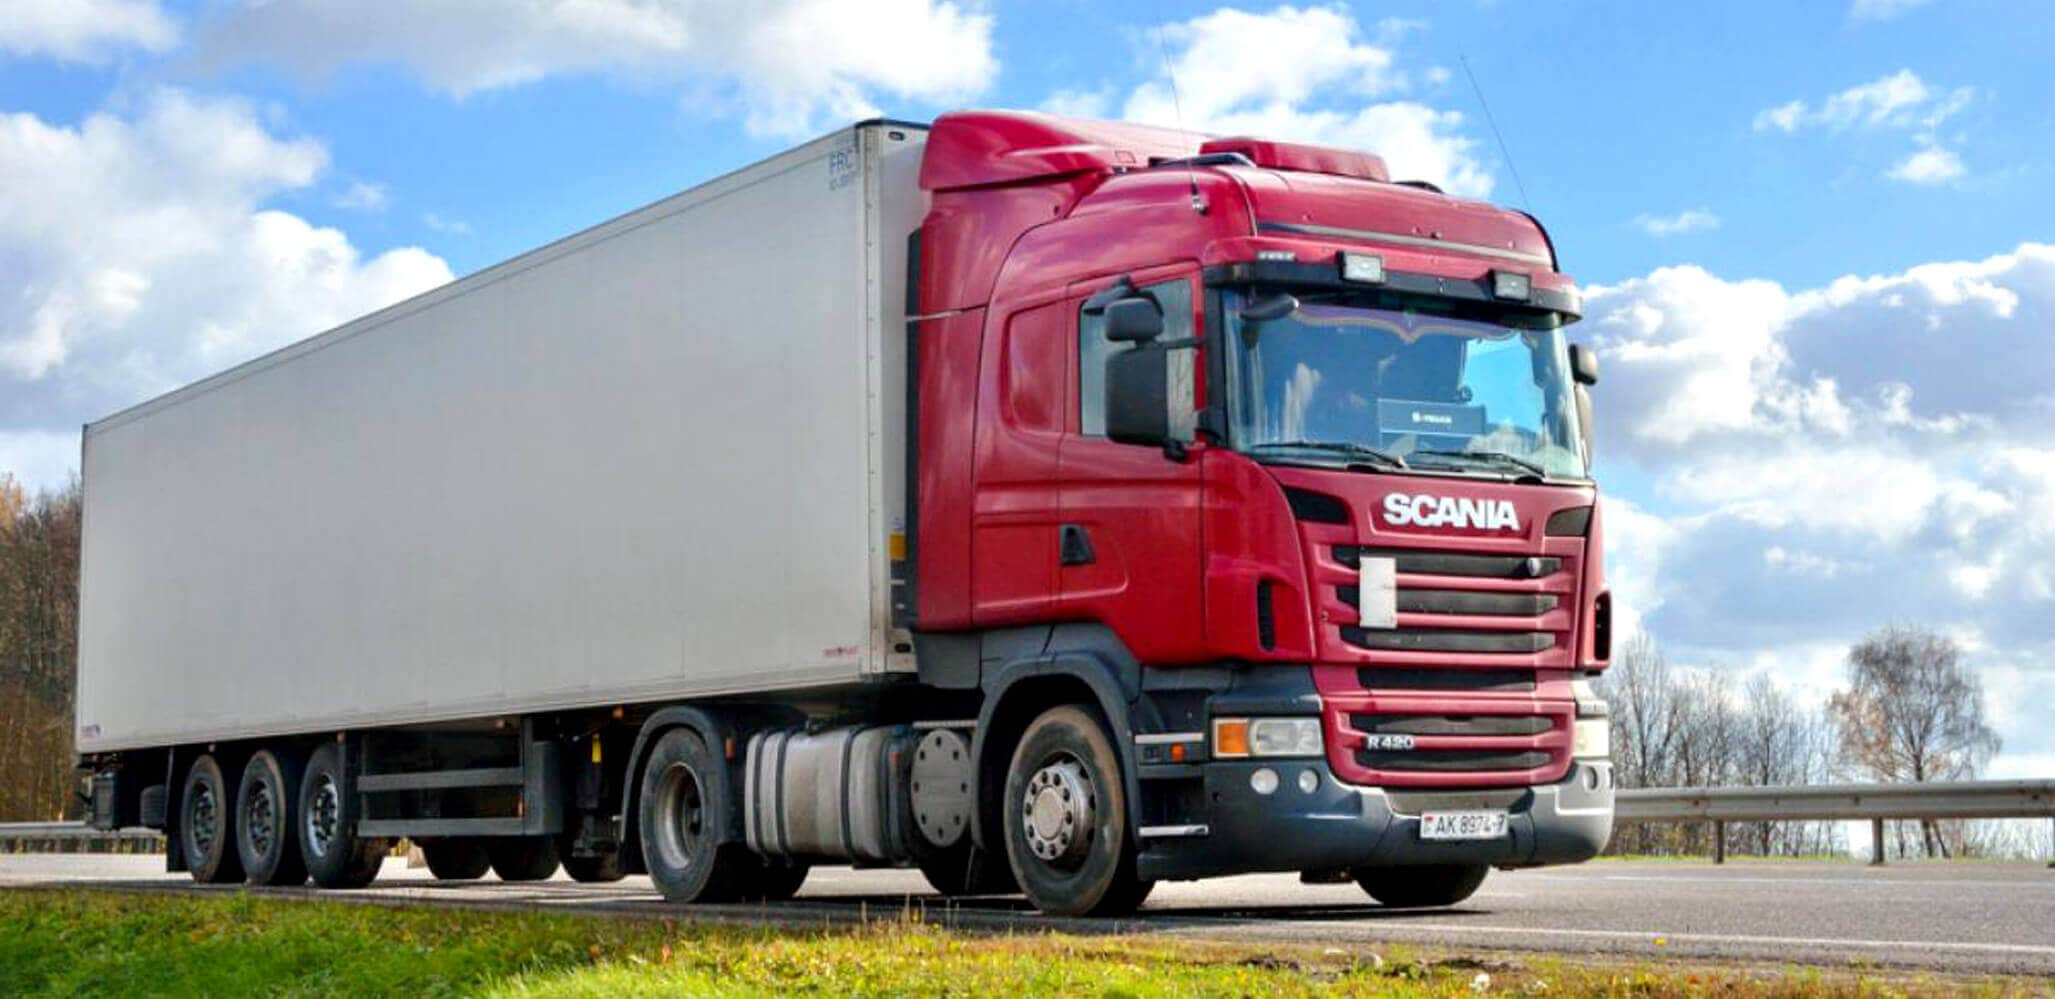 skania truck